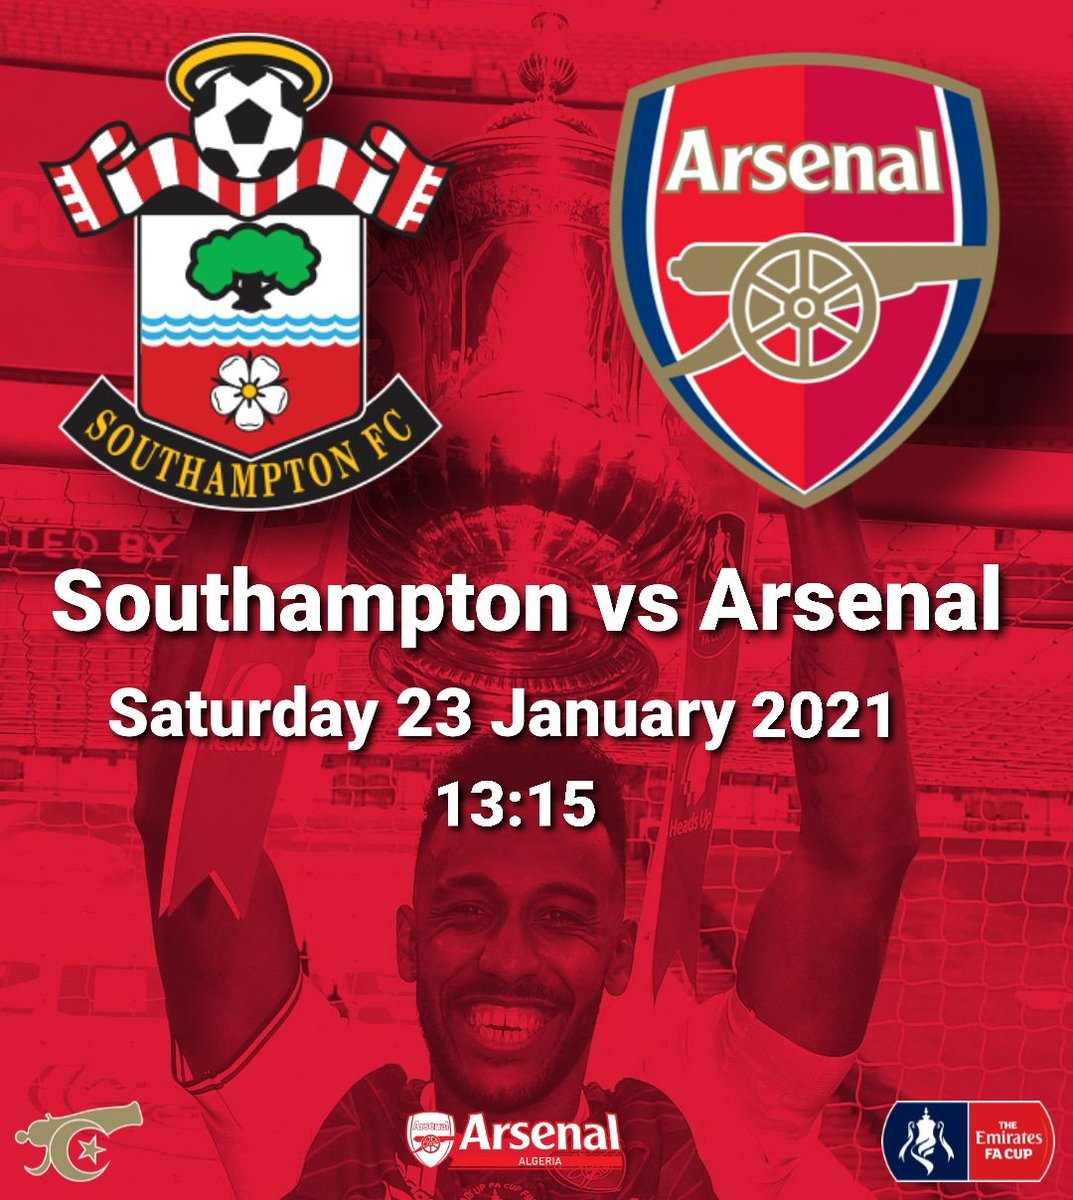 🆚 @SouthamptonFC vs @Arsenal 🏆 @EmiratesFACup 🗓 Saturday 23 January 2021 🕑 13:15 🏟 St Mary's Stadium   #Arsenal #Southampton #Algeria #AlgerianGooners #EmiratesFACup #FACup